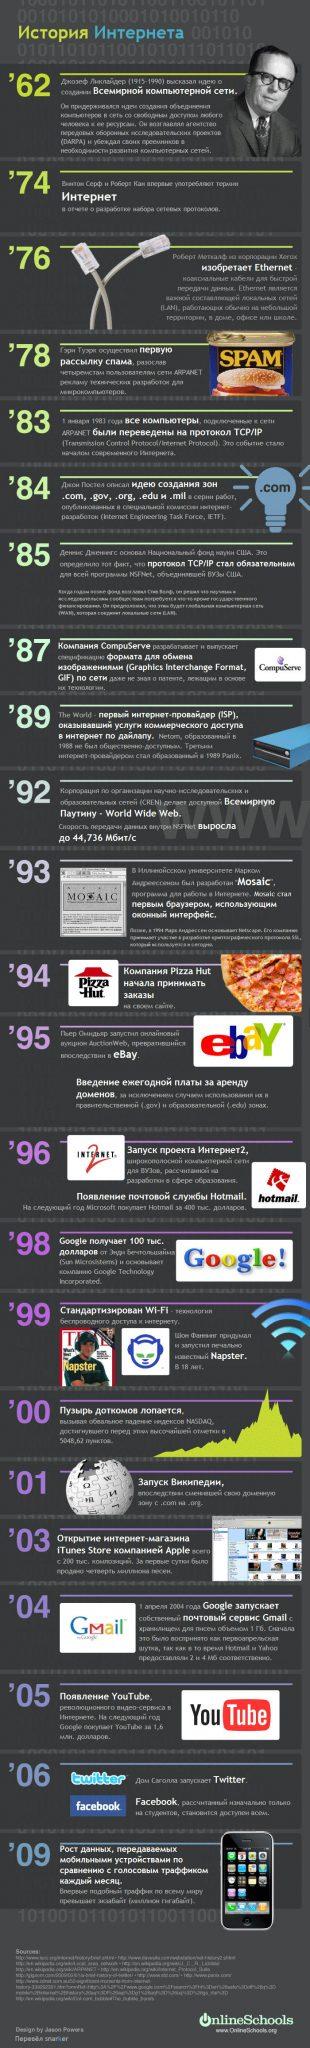 История Интернета